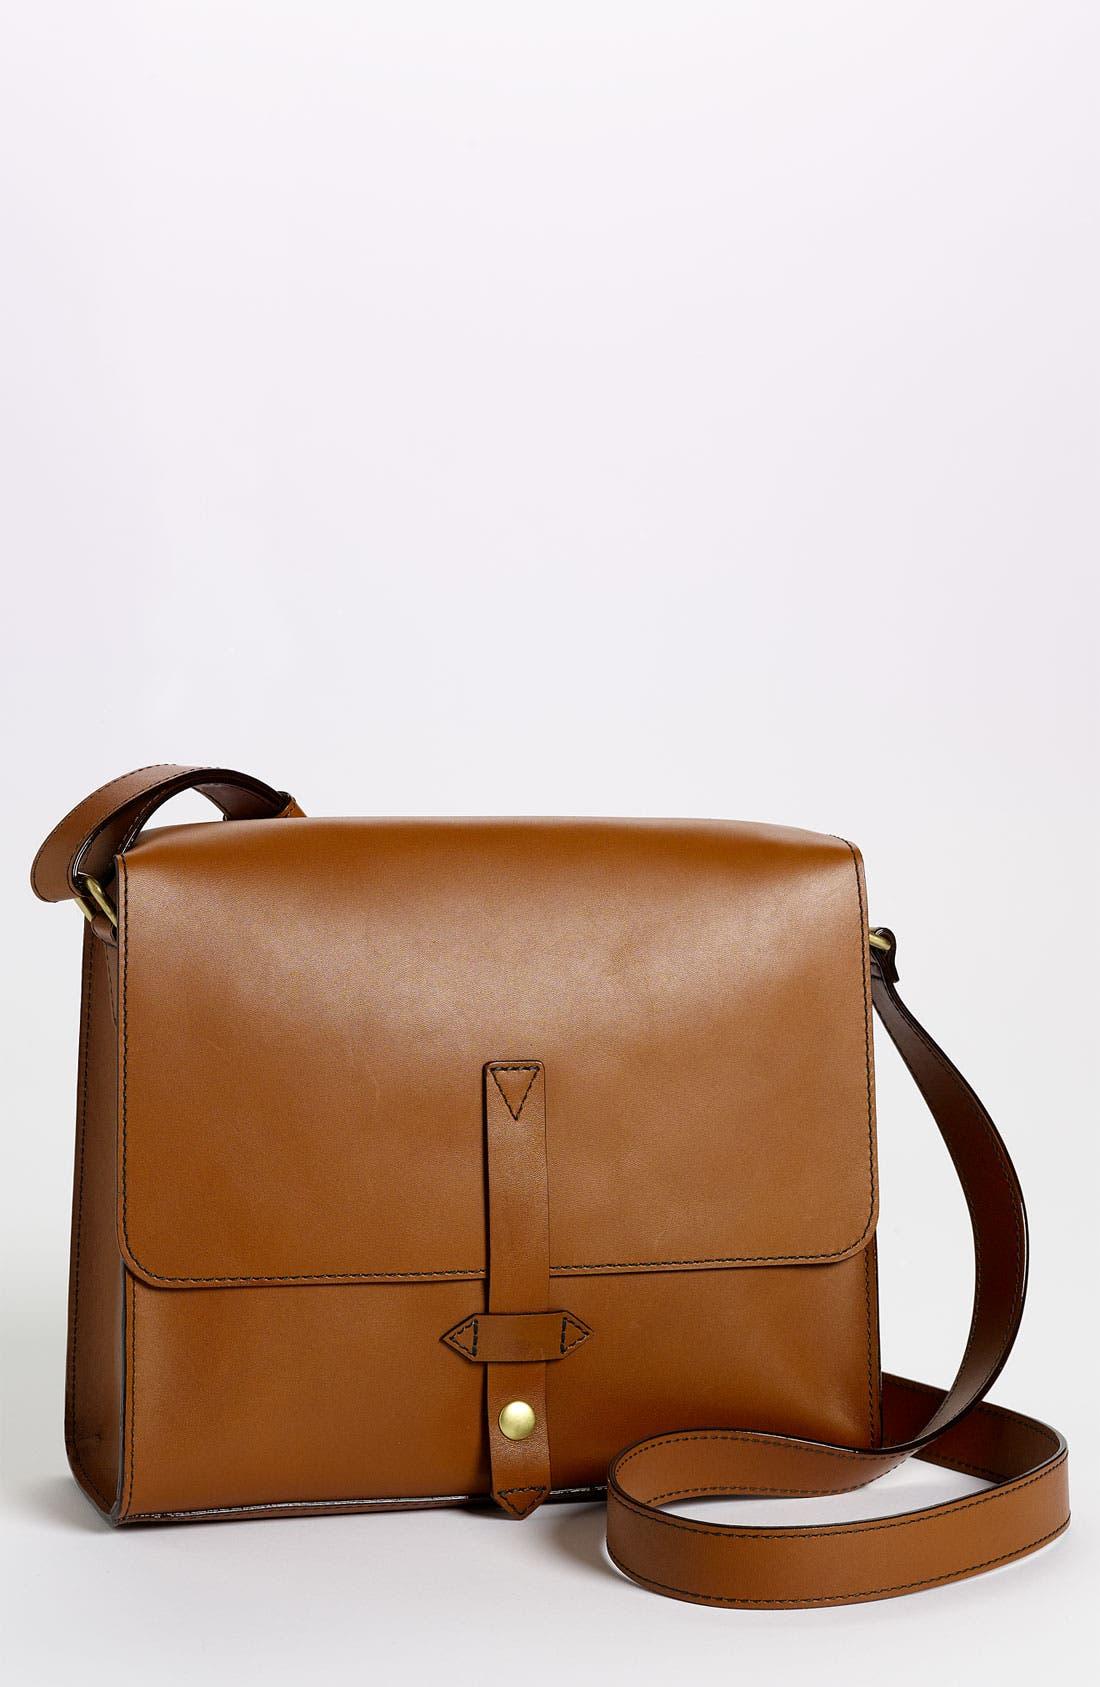 Alternate Image 1 Selected - IIIBeCa By Joy Gryson 'Duane' Crossbody Bag